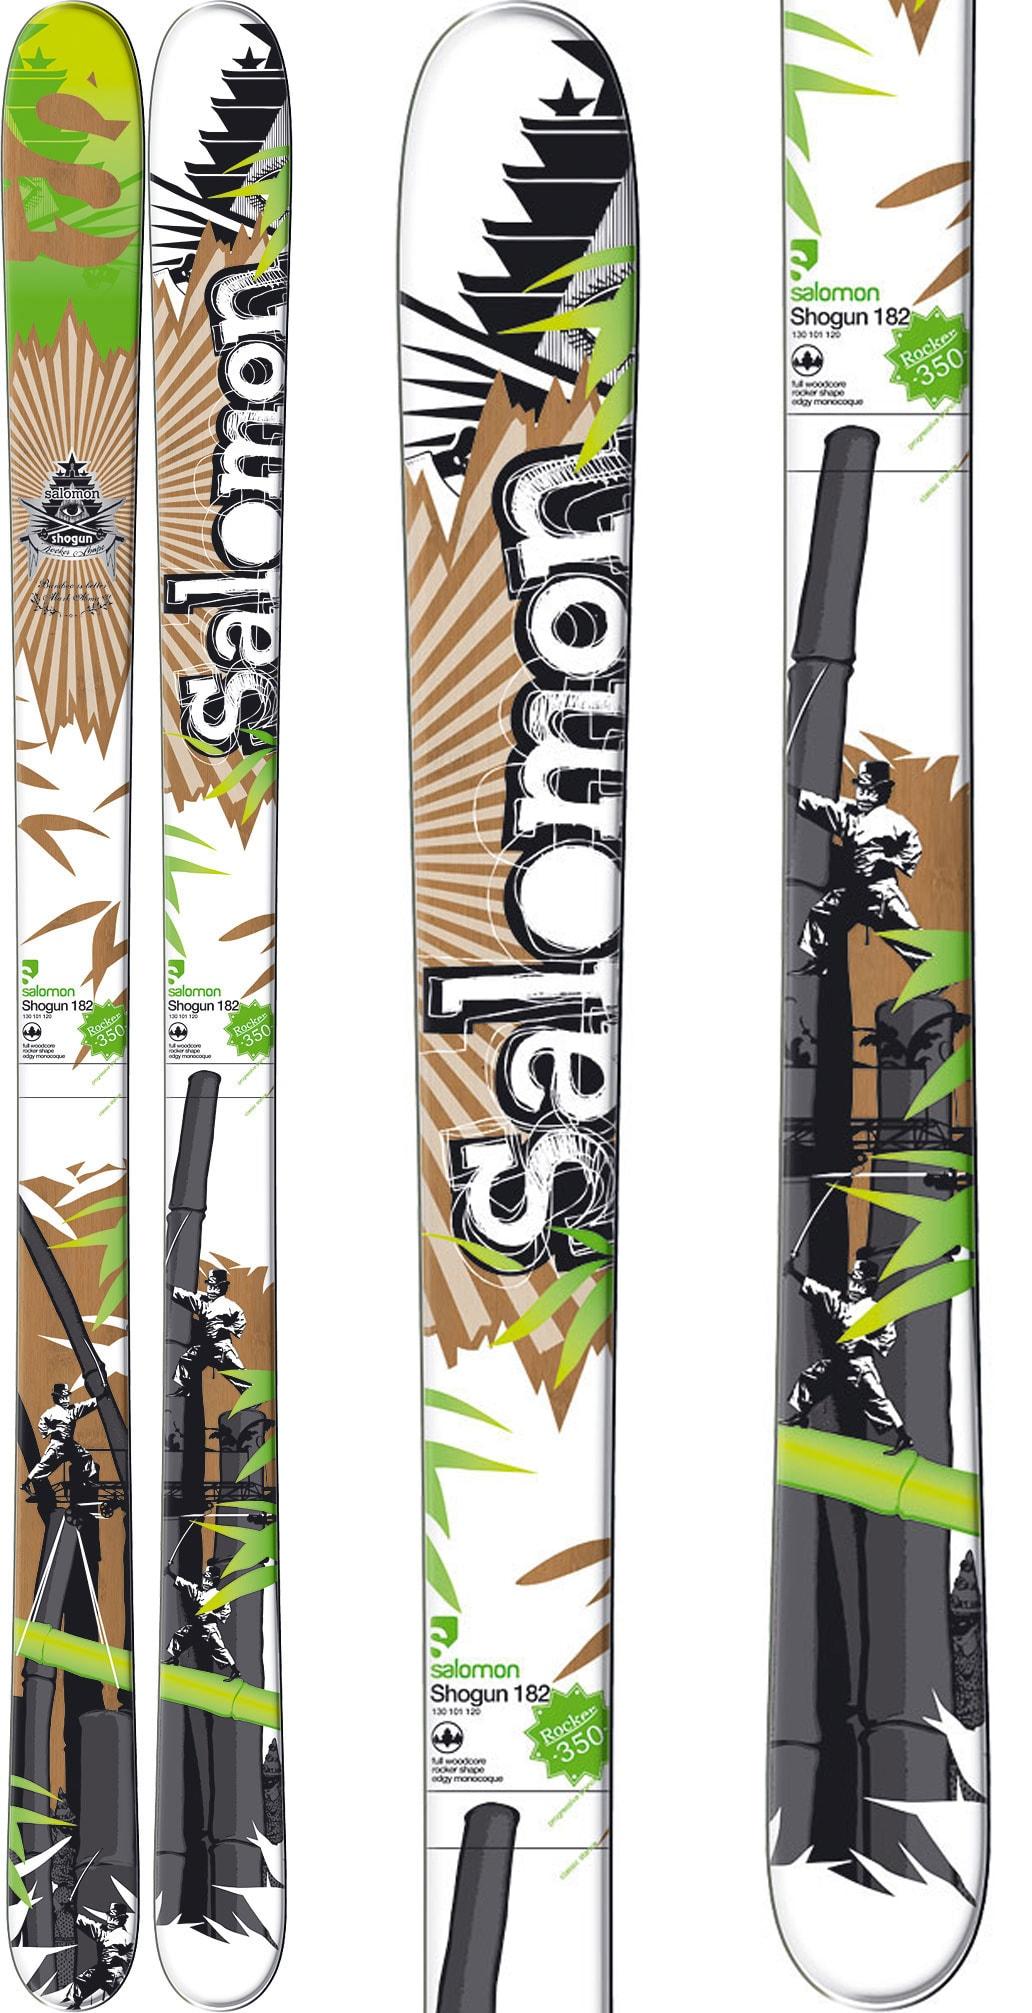 Water Skis For Sale >> Salomon Shogun Skis